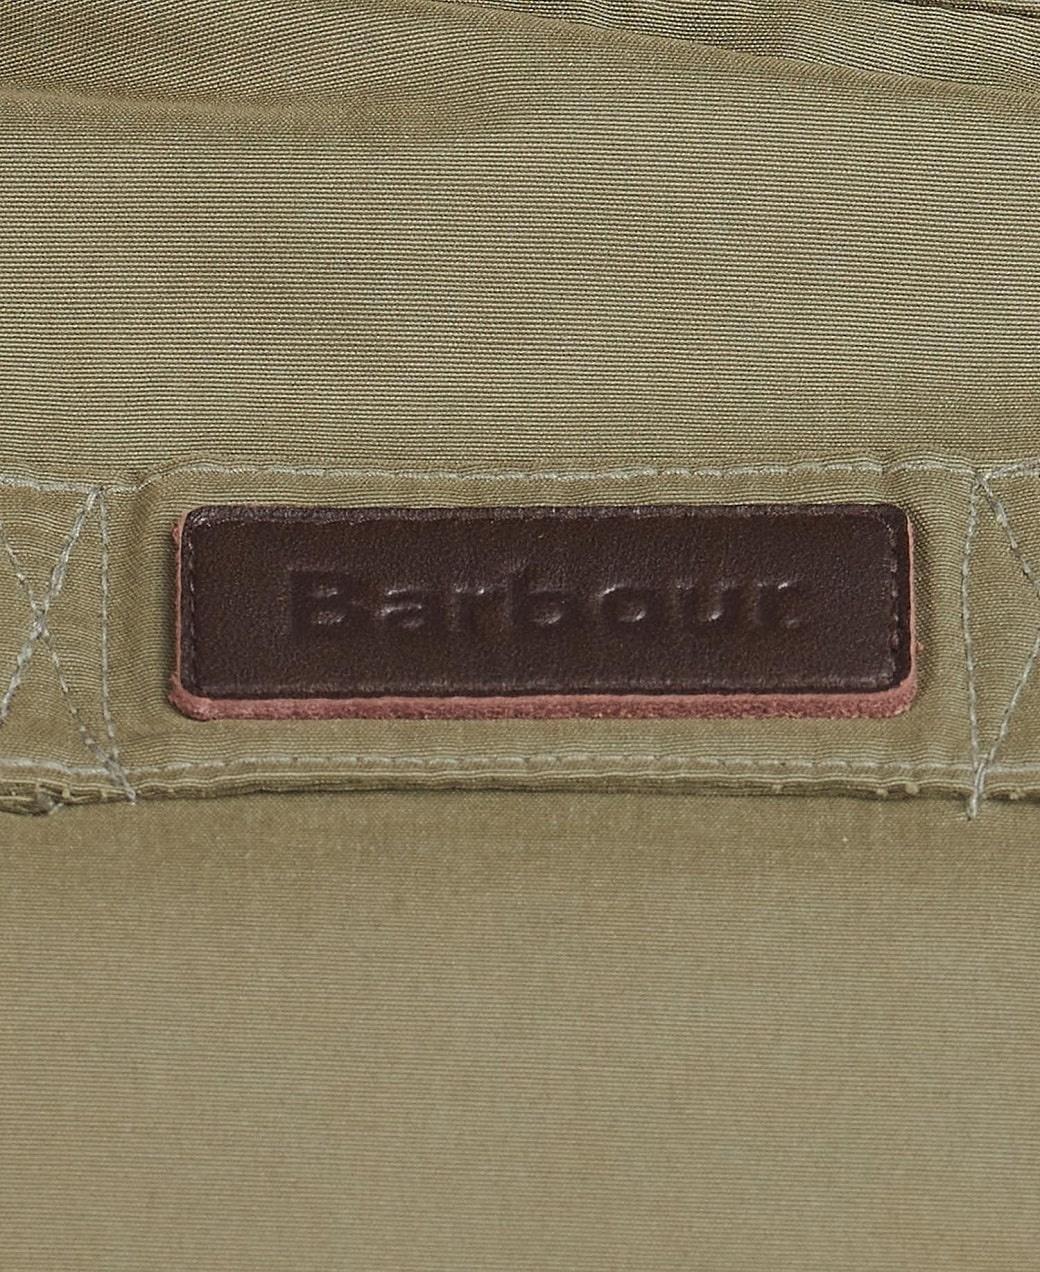 Barbour Sanderling Casual Fern-7